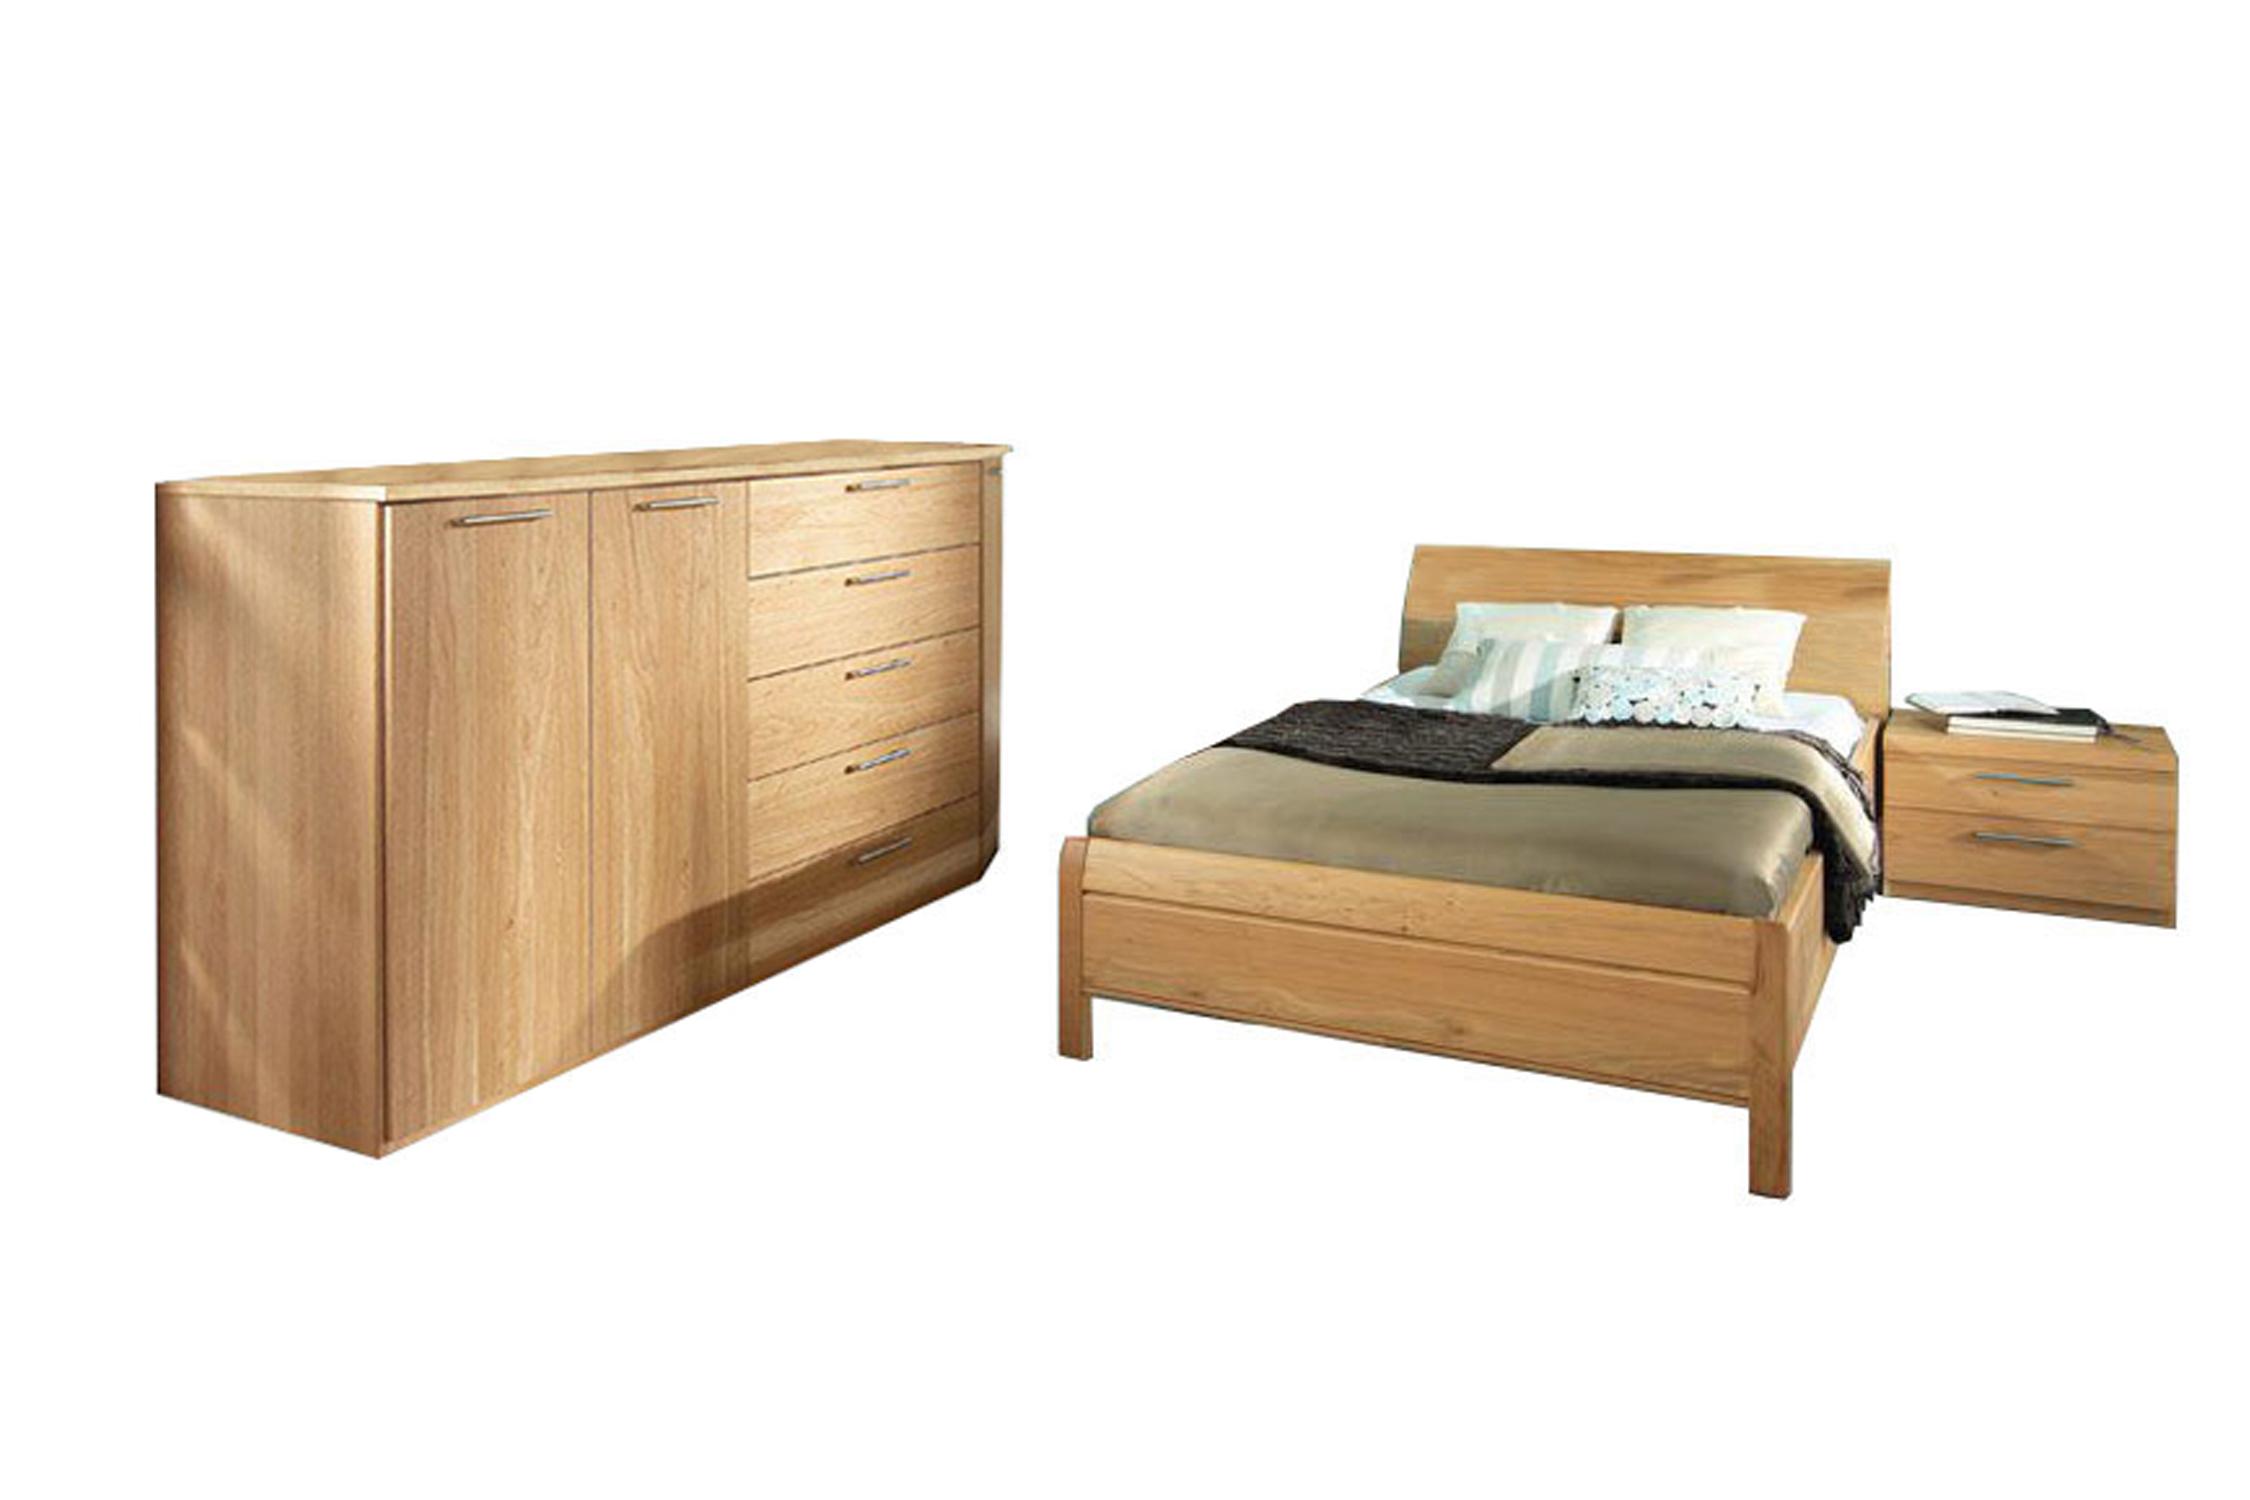 disselkamp comfort v seniorengerecht m bel letz ihr. Black Bedroom Furniture Sets. Home Design Ideas